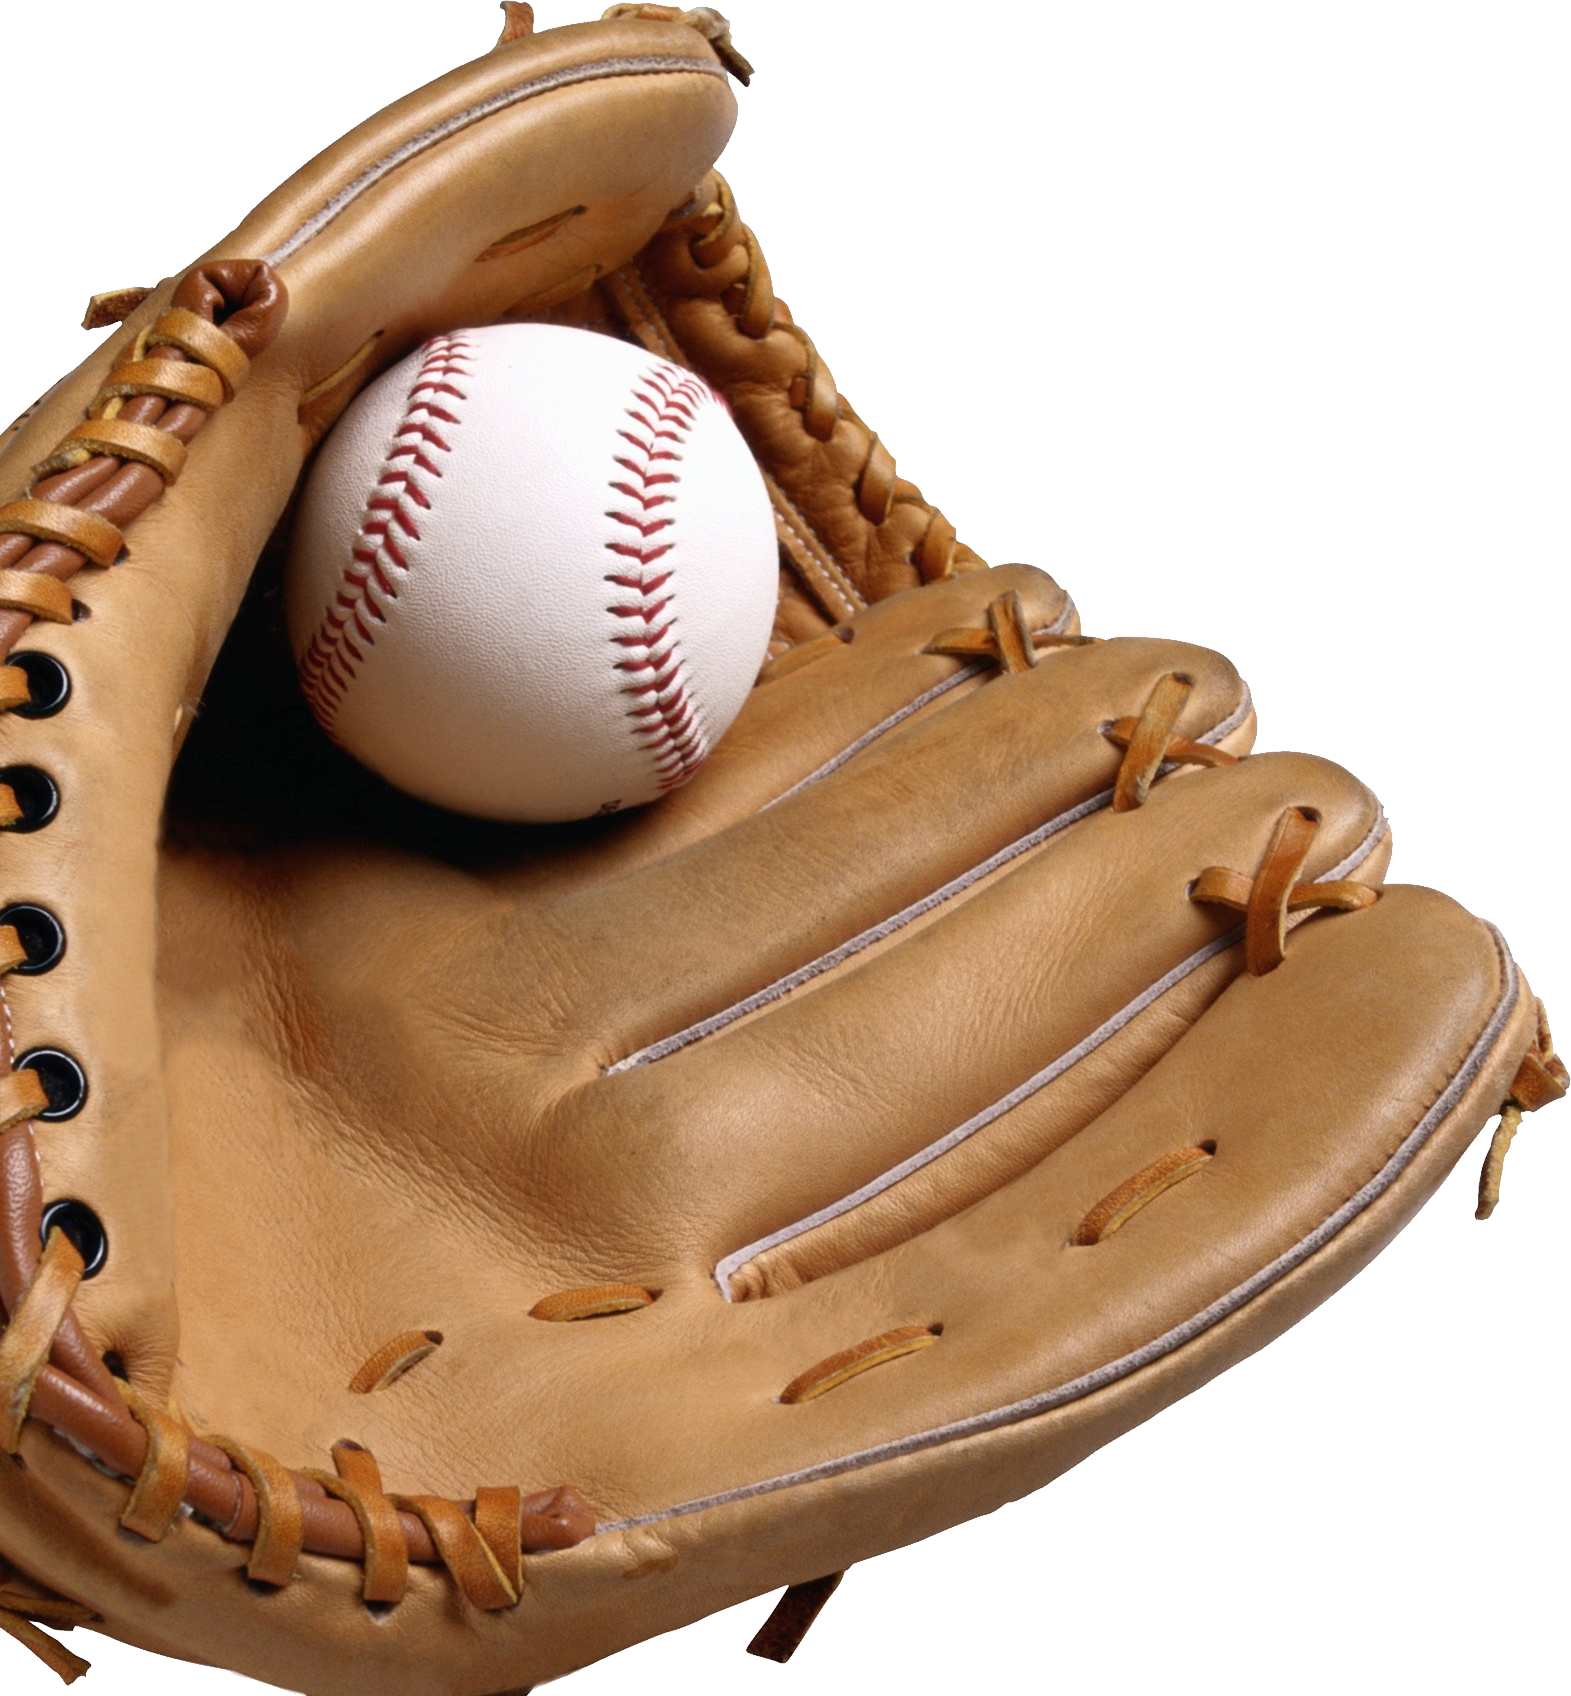 Baseball glove and bat clipart image transparent download Baseball Gloves PNG Image - PurePNG | Free transparent CC0 PNG Image ... image transparent download